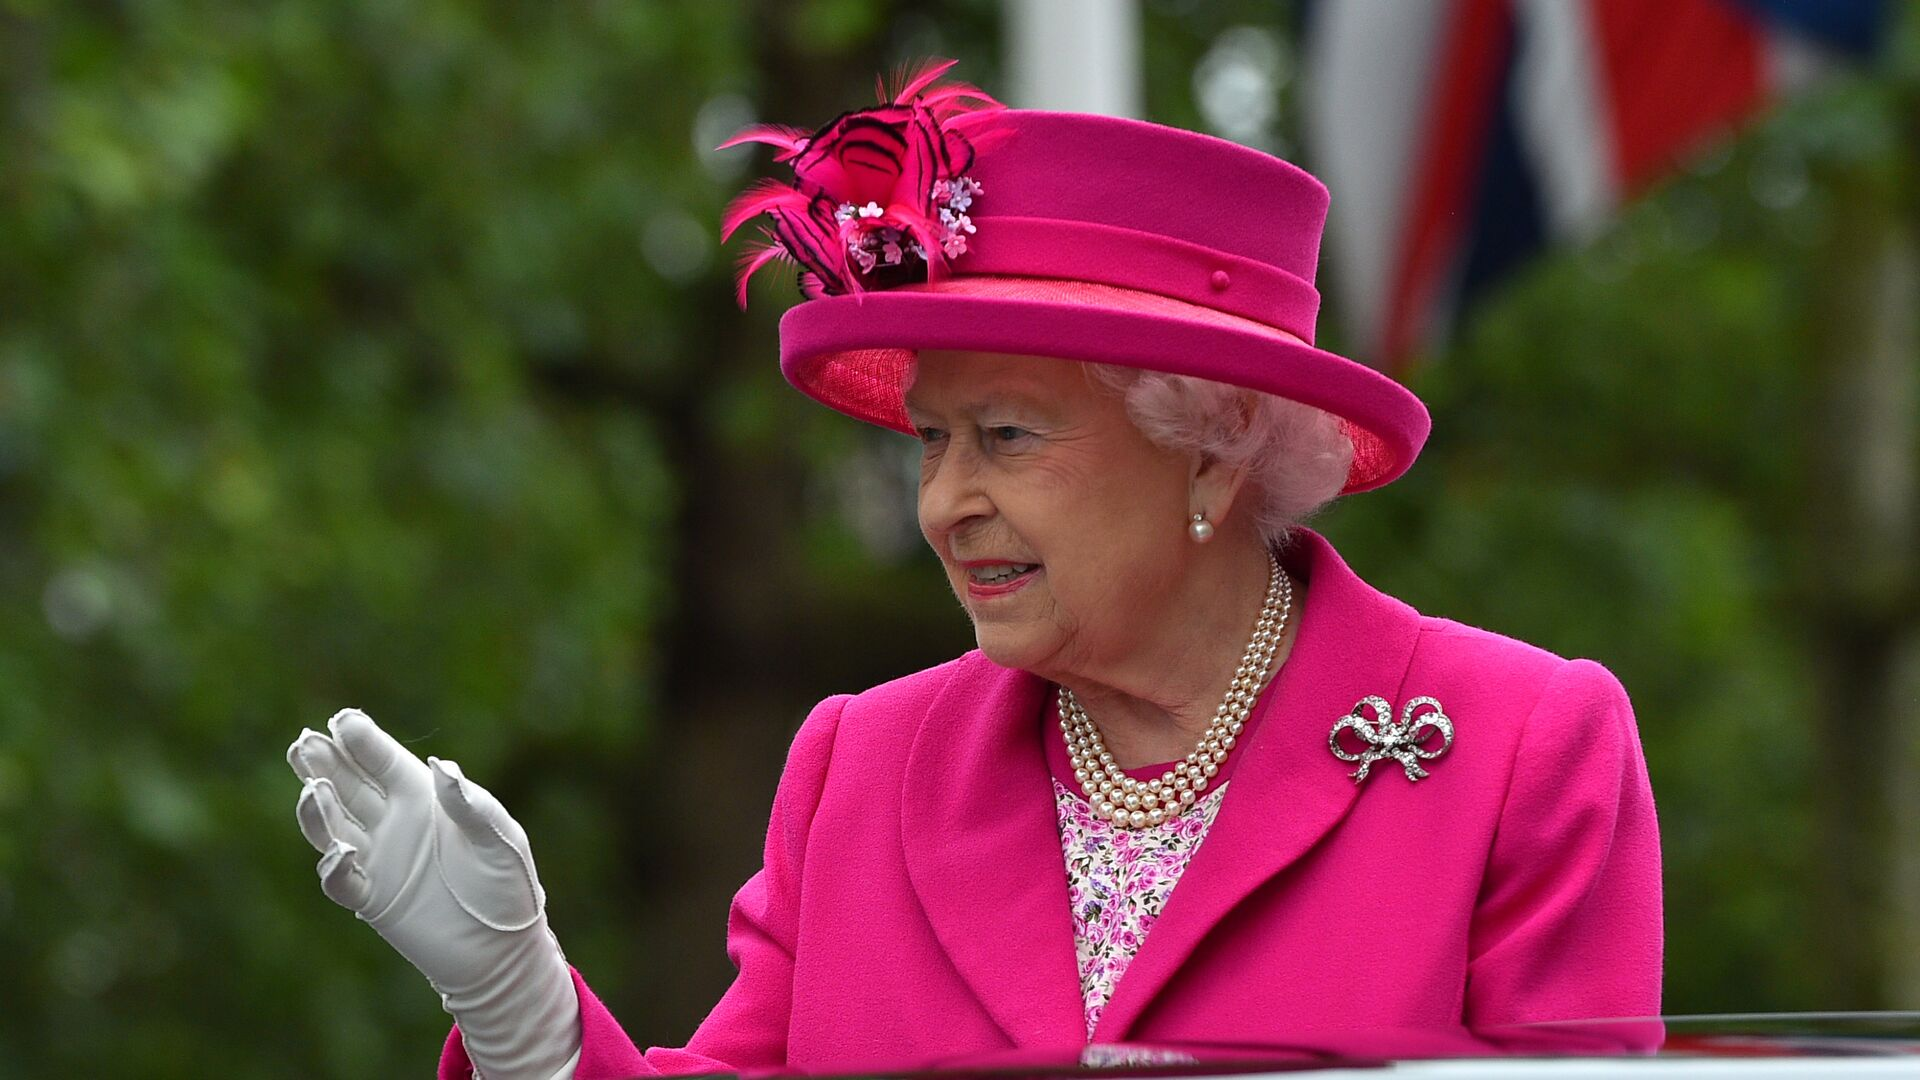 La reina del Reino Unido, Isabel II - Sputnik Mundo, 1920, 13.02.2021